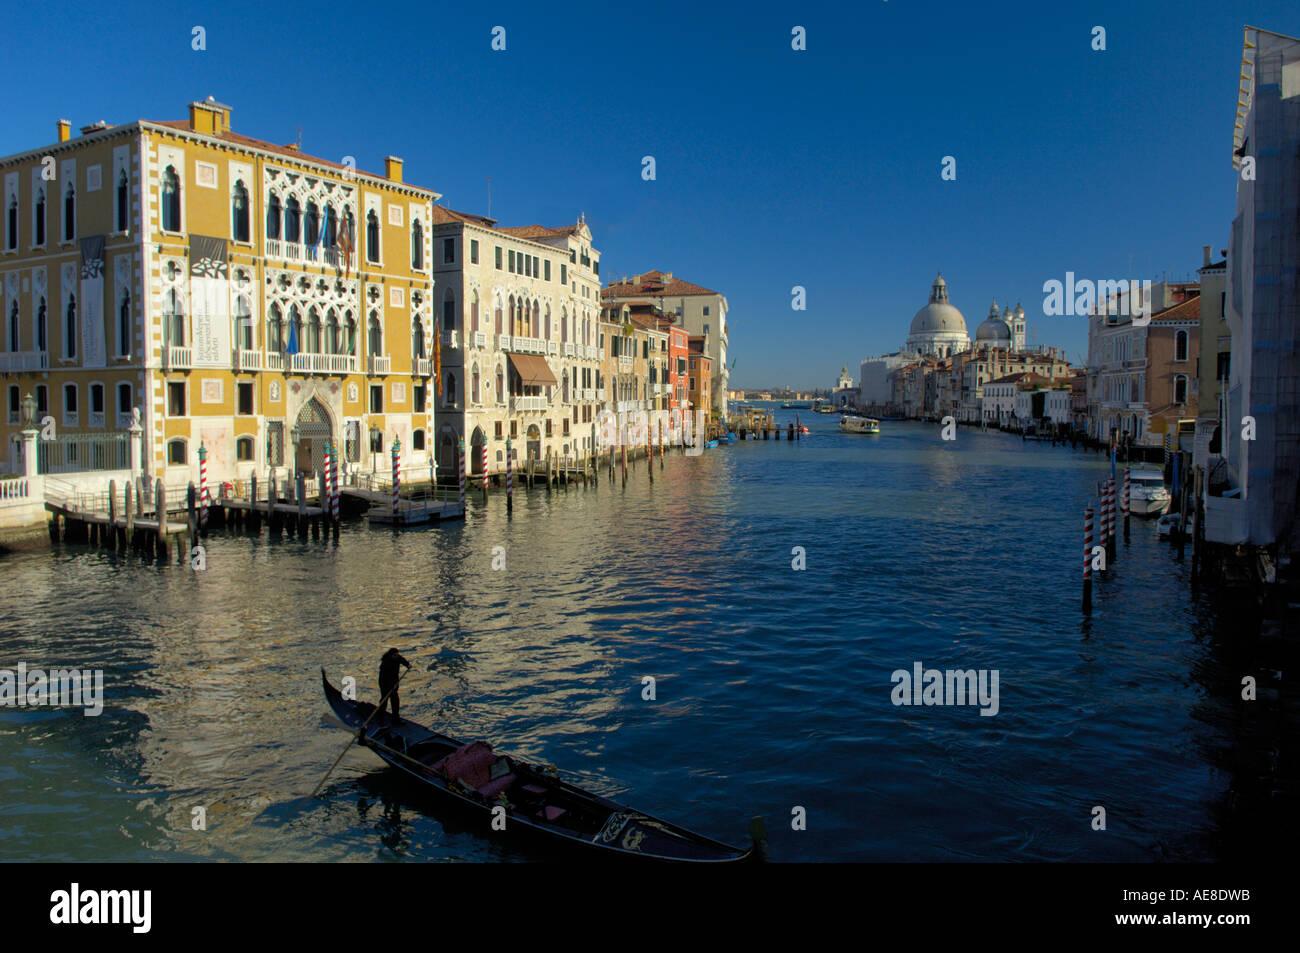 View from Academia Bridge towards Santa Maria Della Salute, Venice Stock Photo